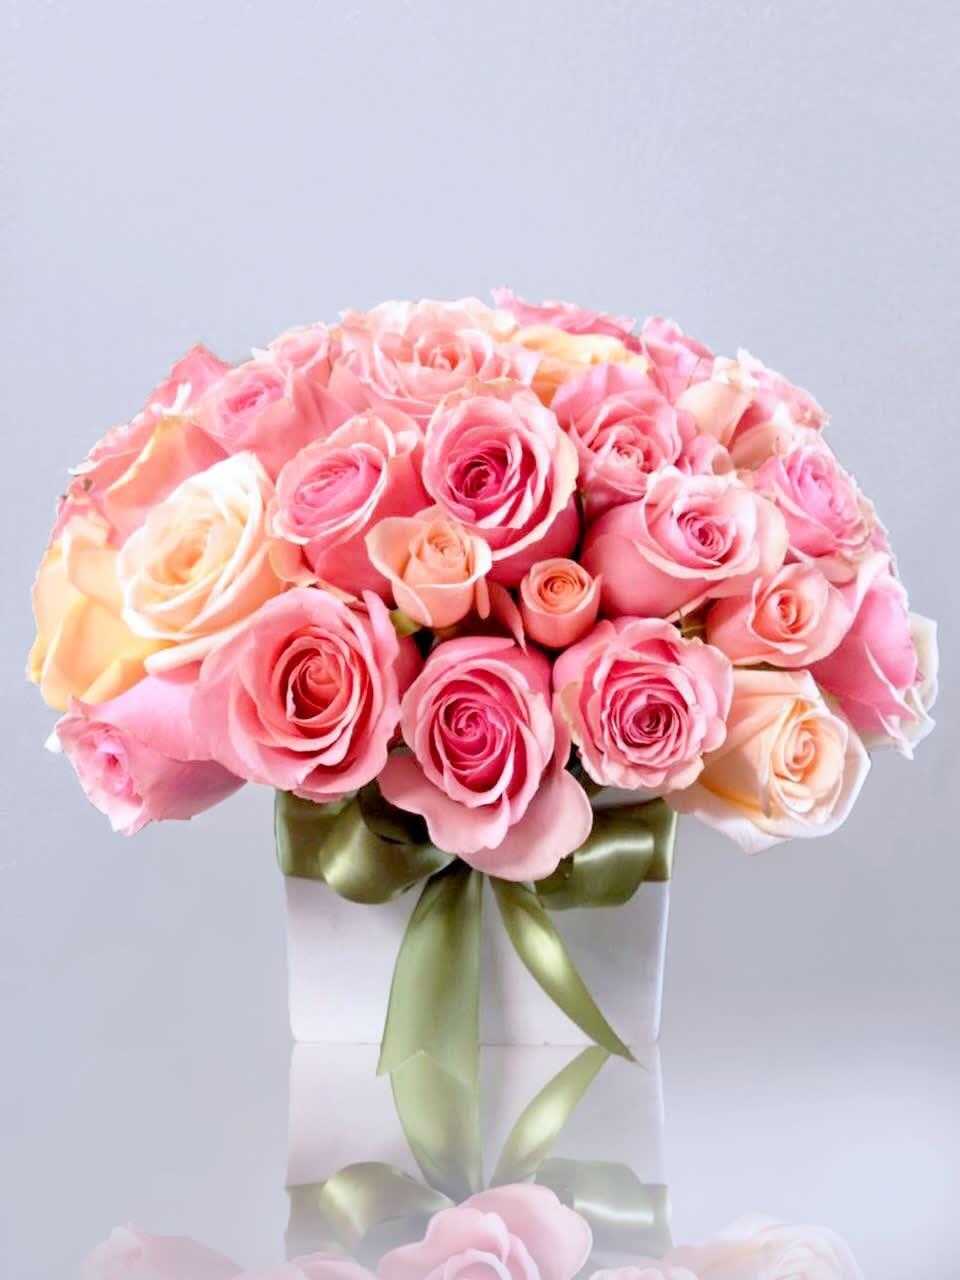 Le Fleur Vase 50 roses in Hollywood, CA